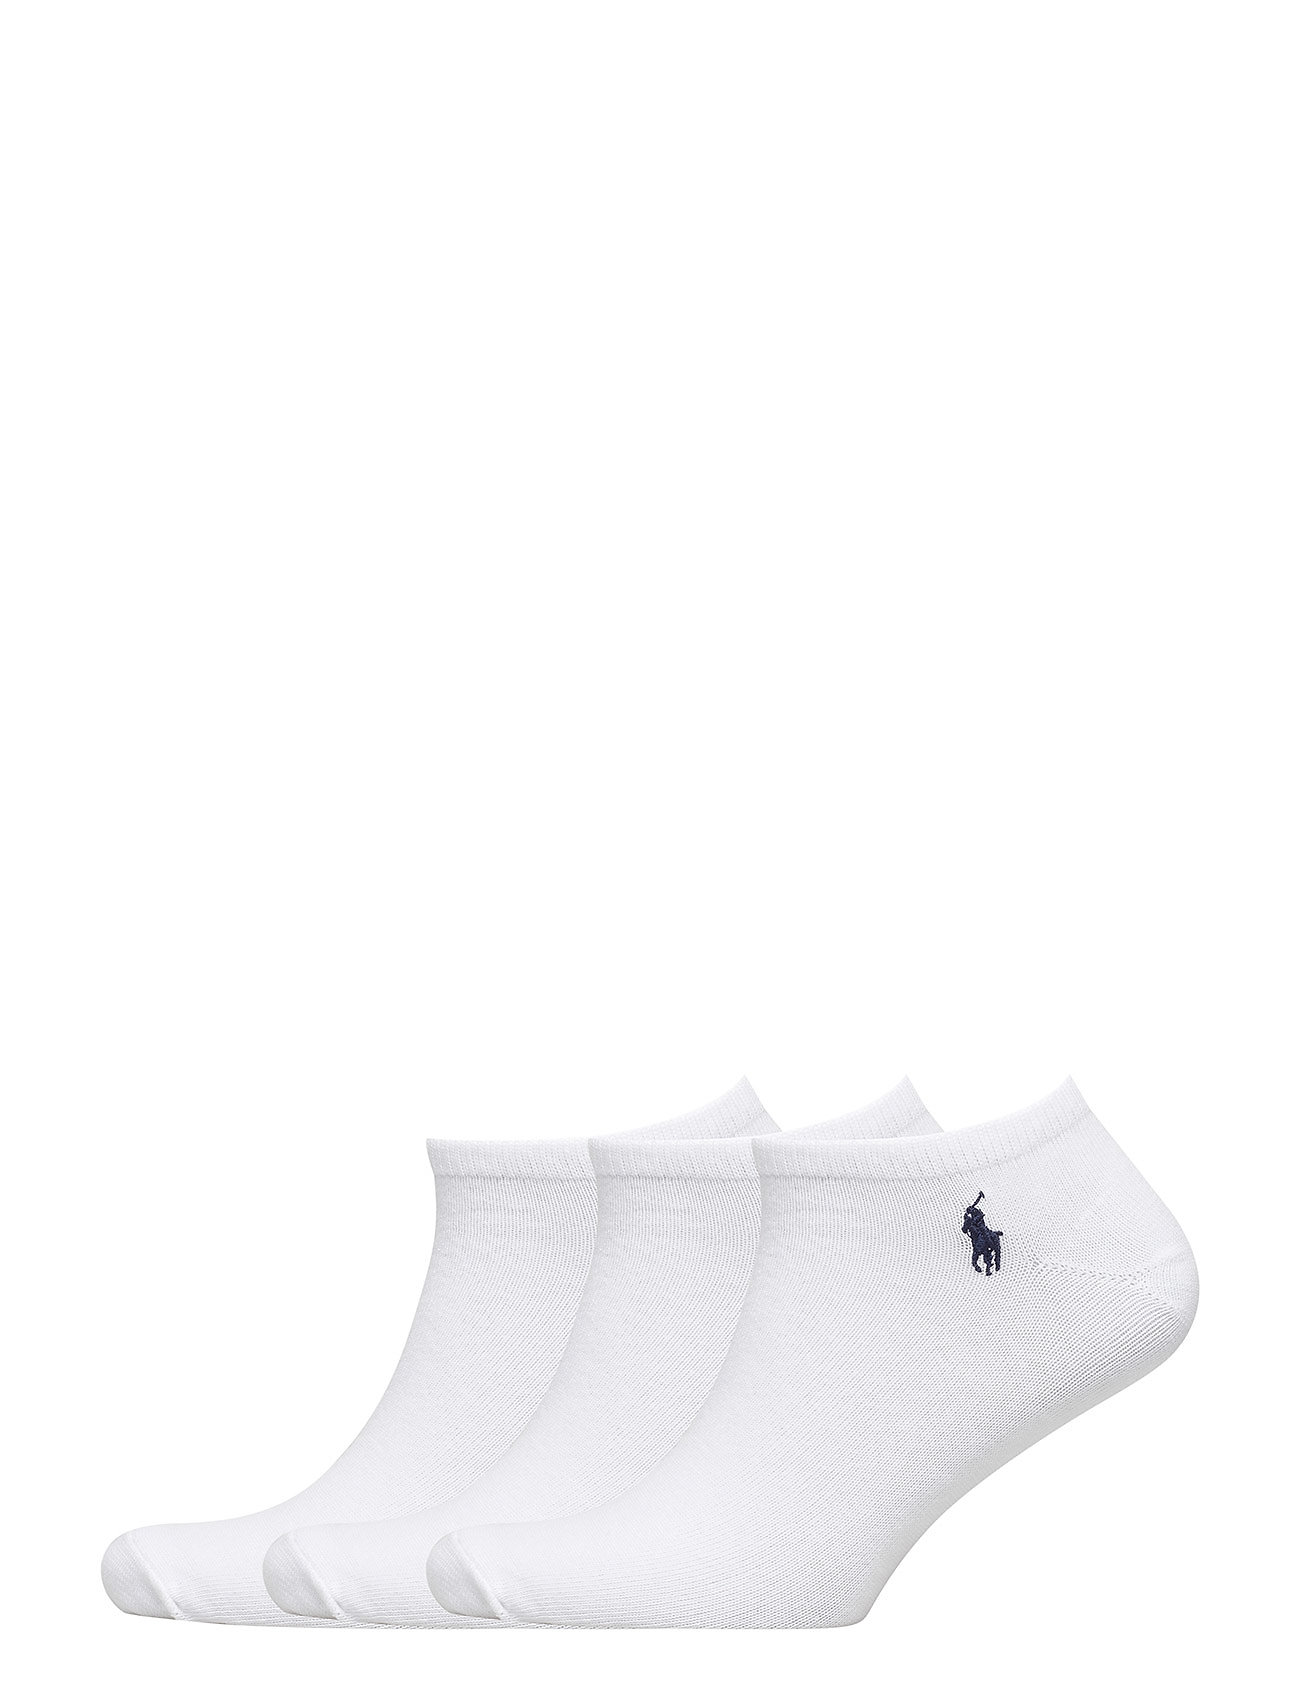 Polo Ralph Lauren Underwear GHOST PED PP-SOCKS-3 PACK - WHITE